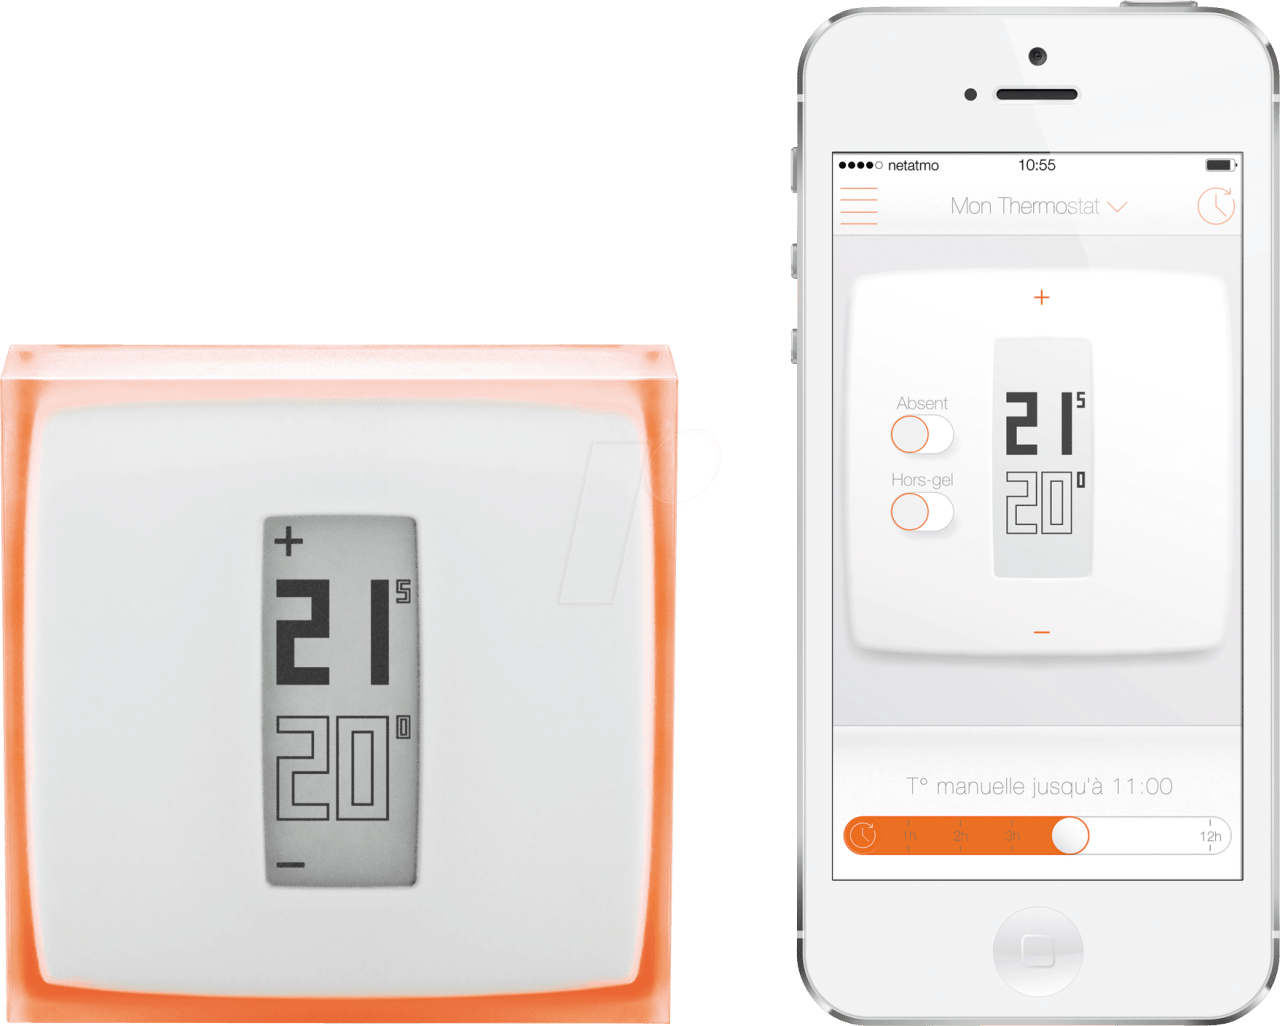 Transparent/Weiss Netatmo NTH01-DE-EC Smart Thermostat.1